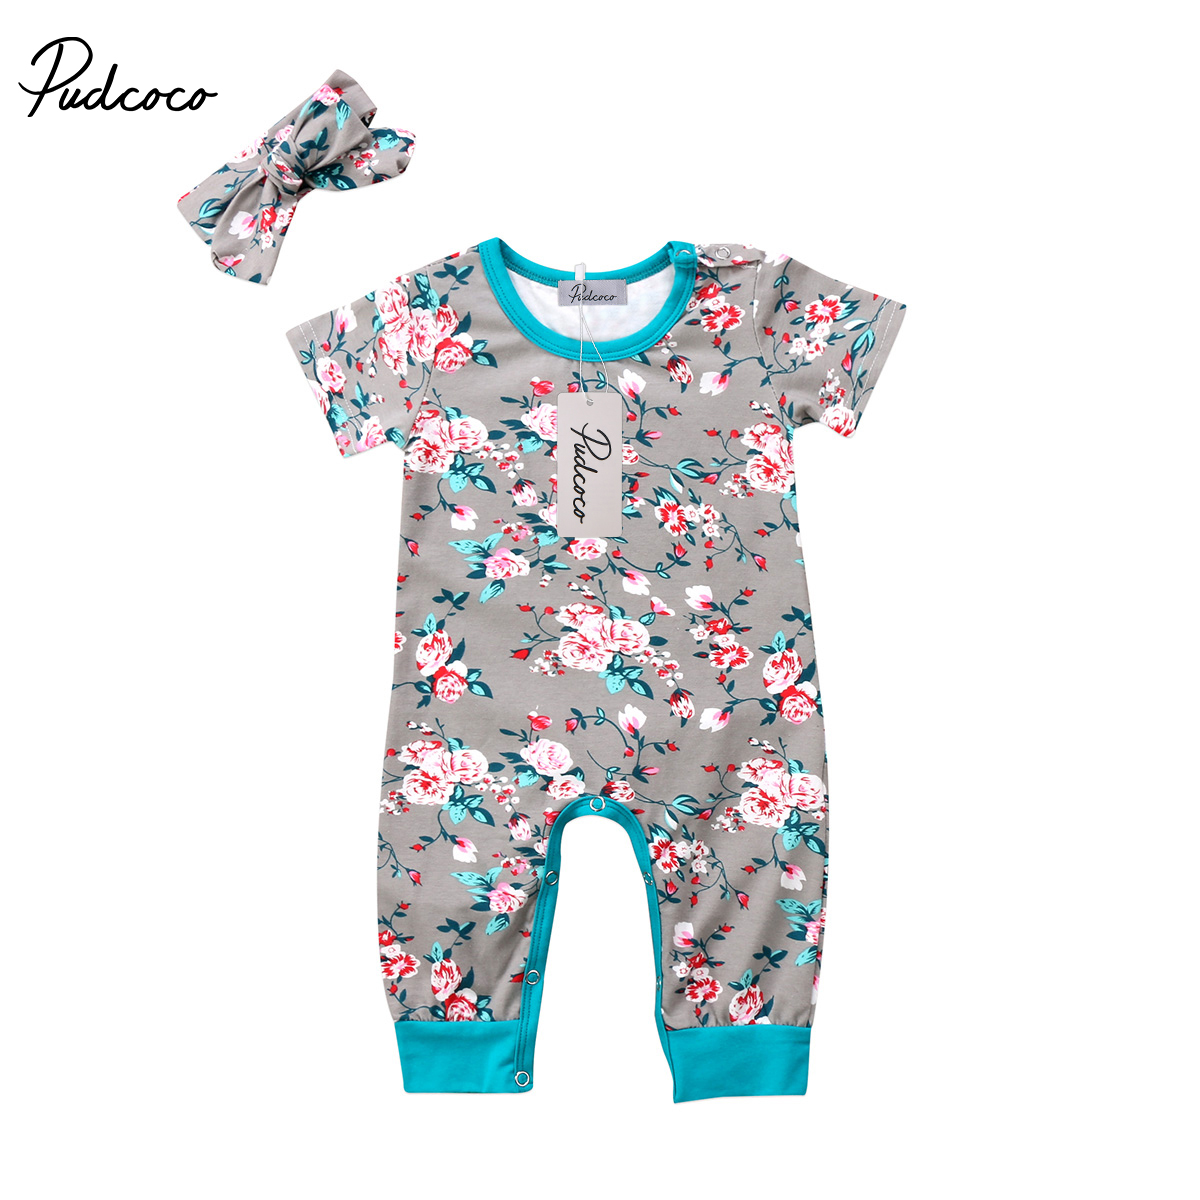 UK Newborn Kids Baby Girl Floral Romper Jumpsuit Outfits Sunsuit Clothes 0-18M